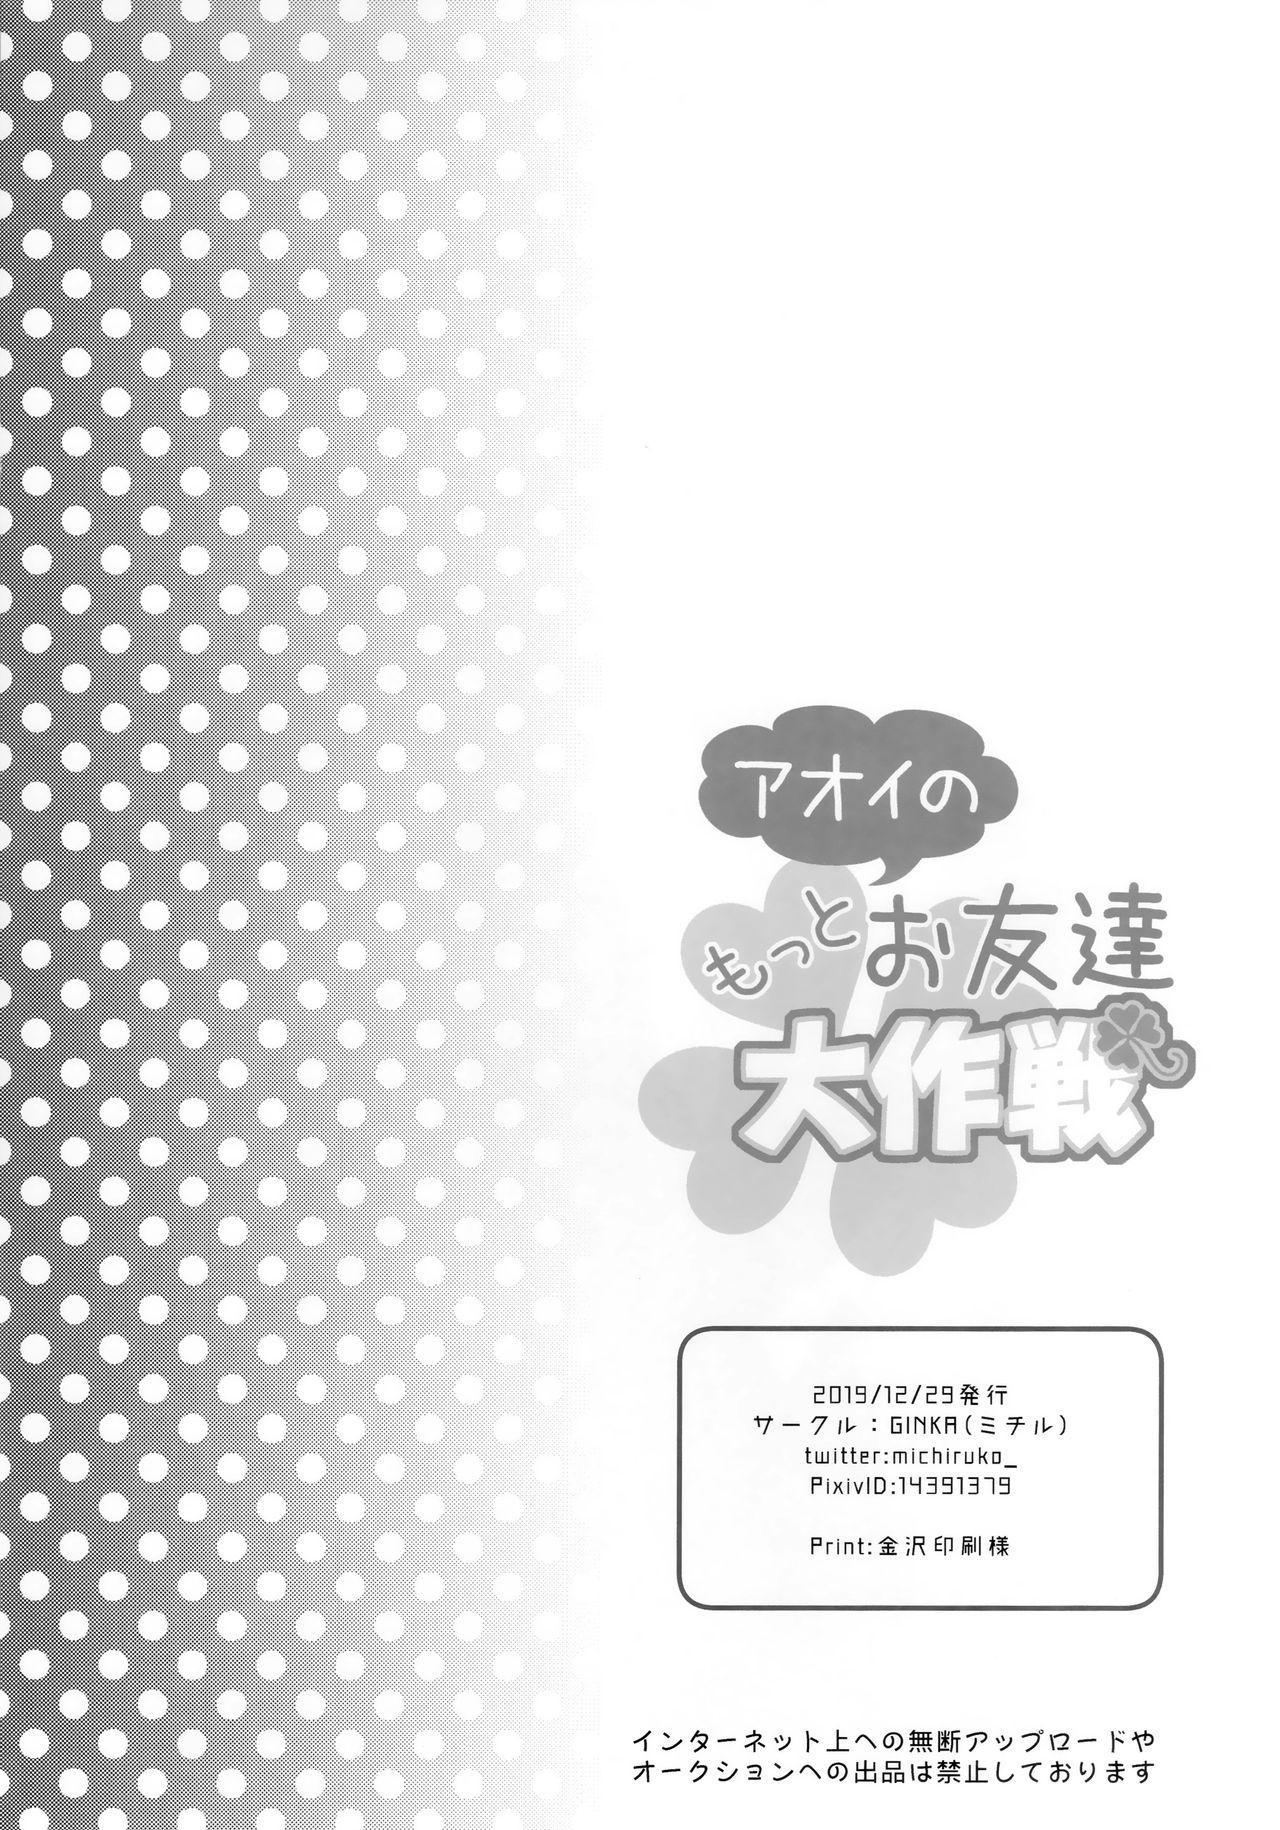 Aoi no Motto Otomodachi Daisakusen 23